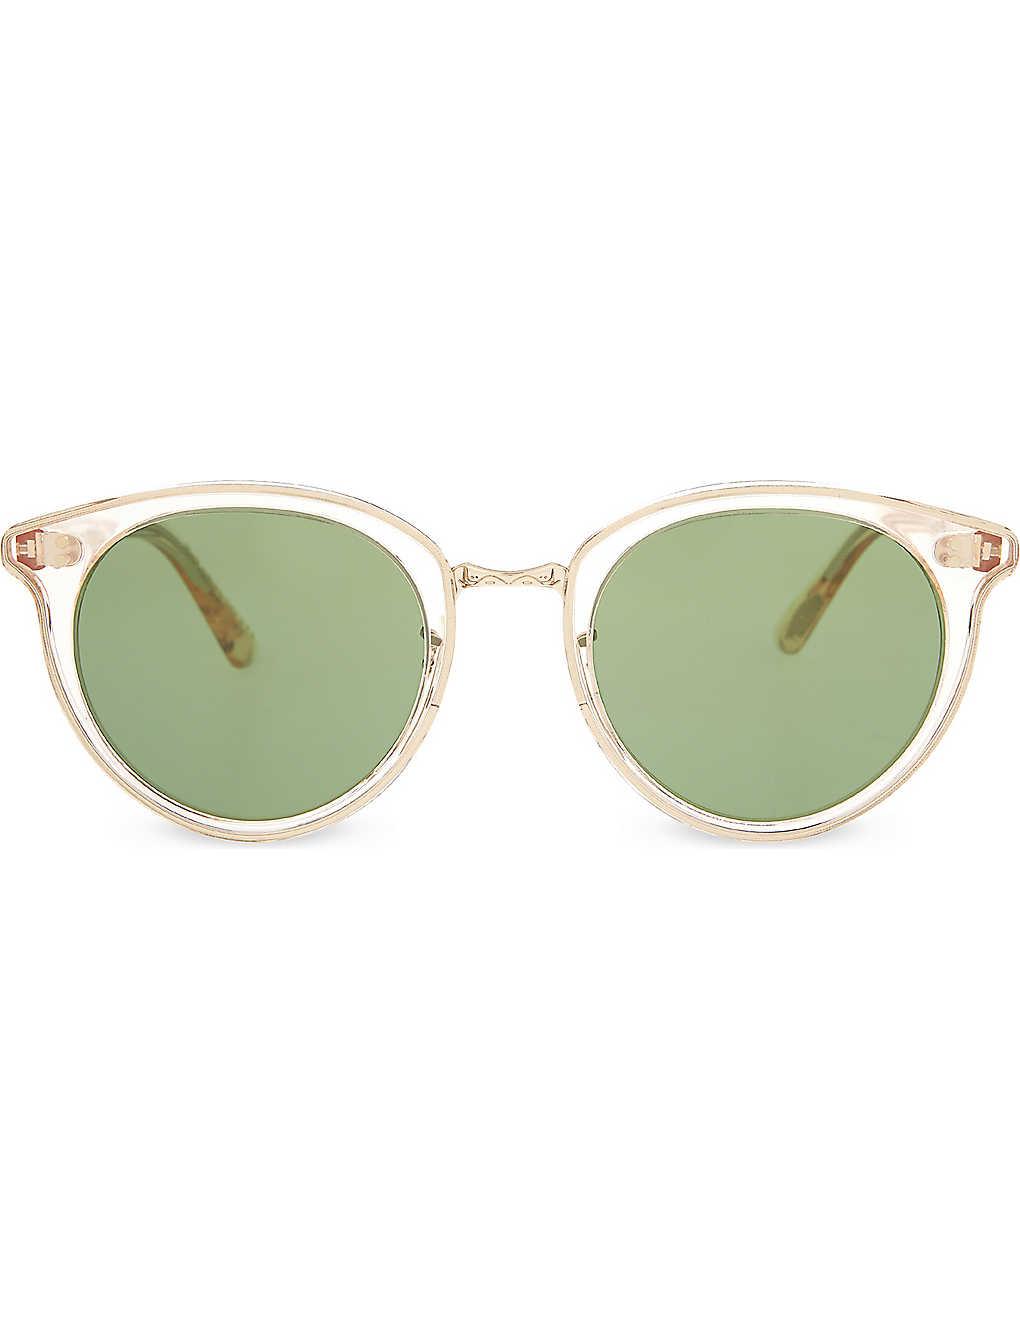 27f8434eefd OLIVER PEOPLES - Spelman OV5323S round-frame sunglasses